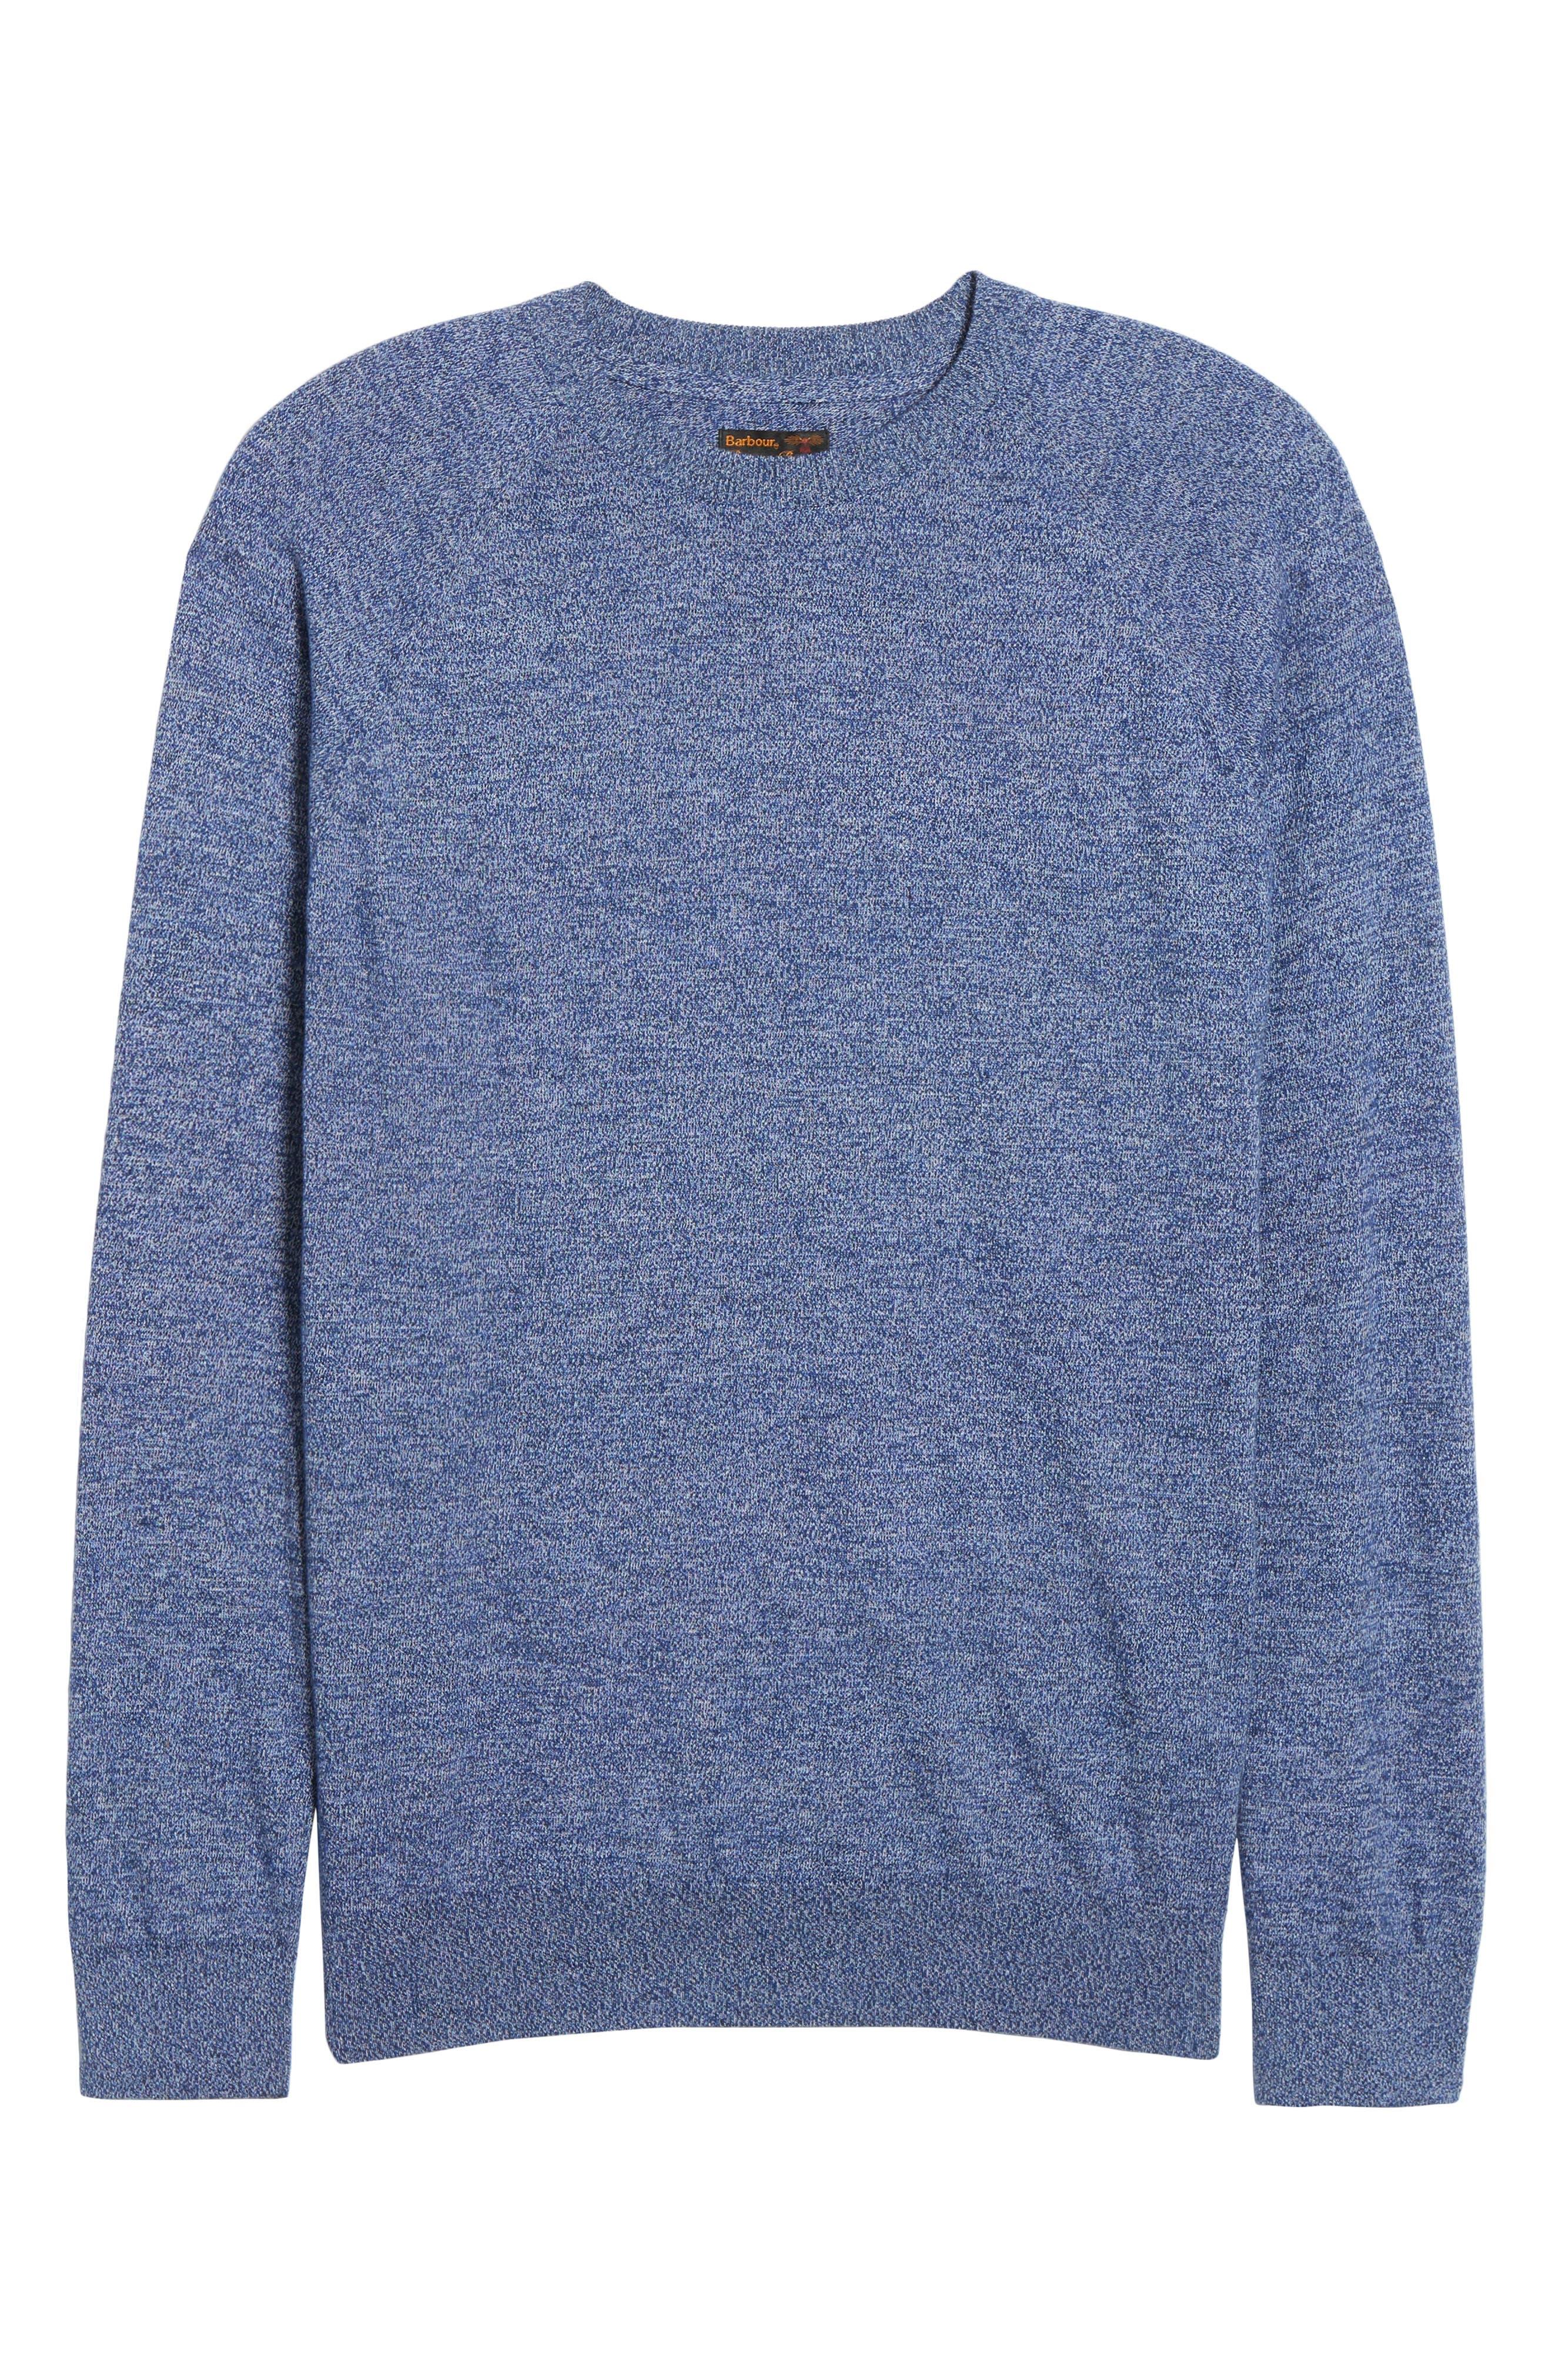 Space Dye Crewneck Shirt,                             Alternate thumbnail 6, color,                             450